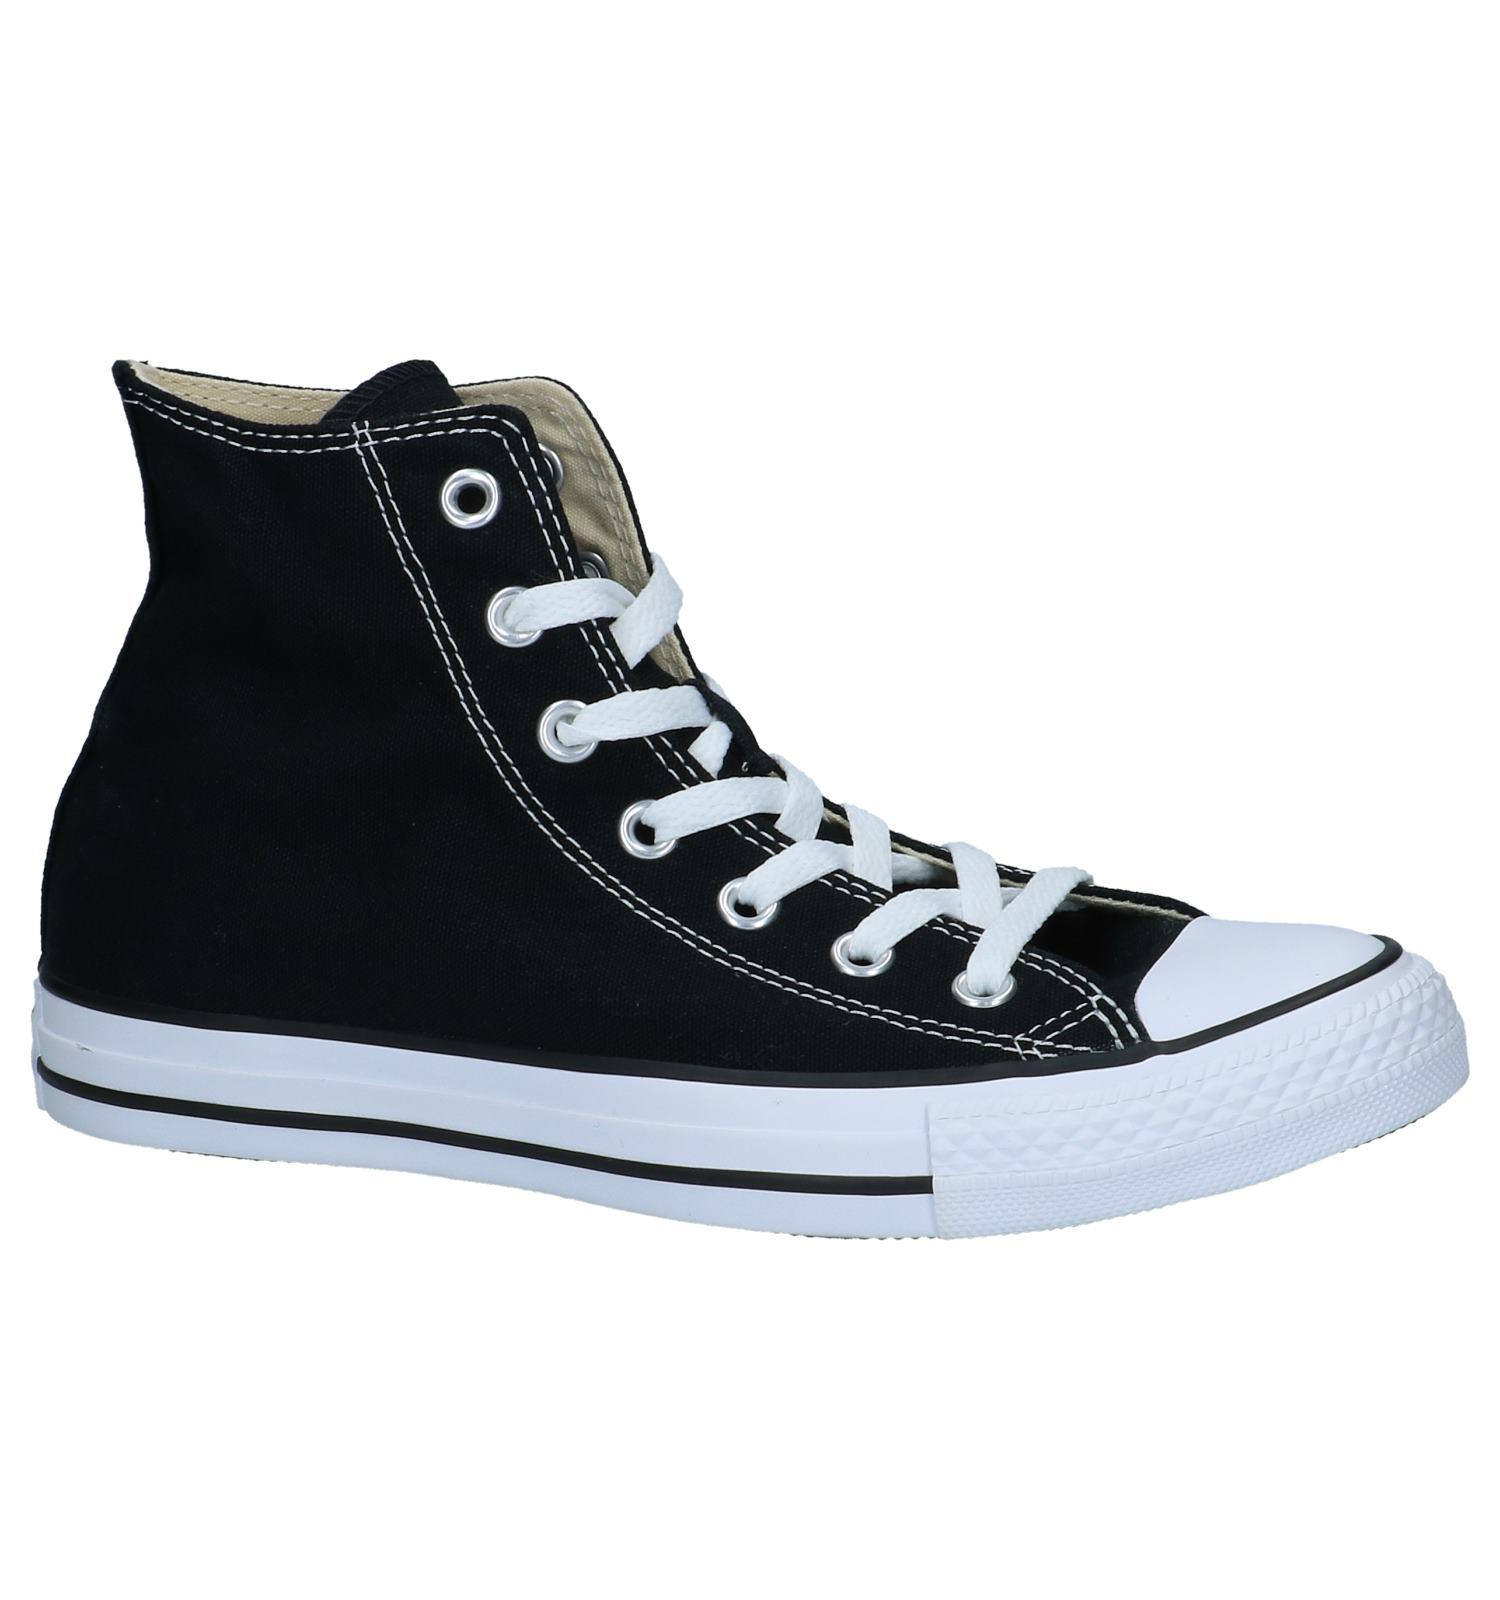 e6659855cf0 Zwarte Converse Chuck Taylor All Star Hi Sneakers | TORFS.BE | Gratis  verzend en retour